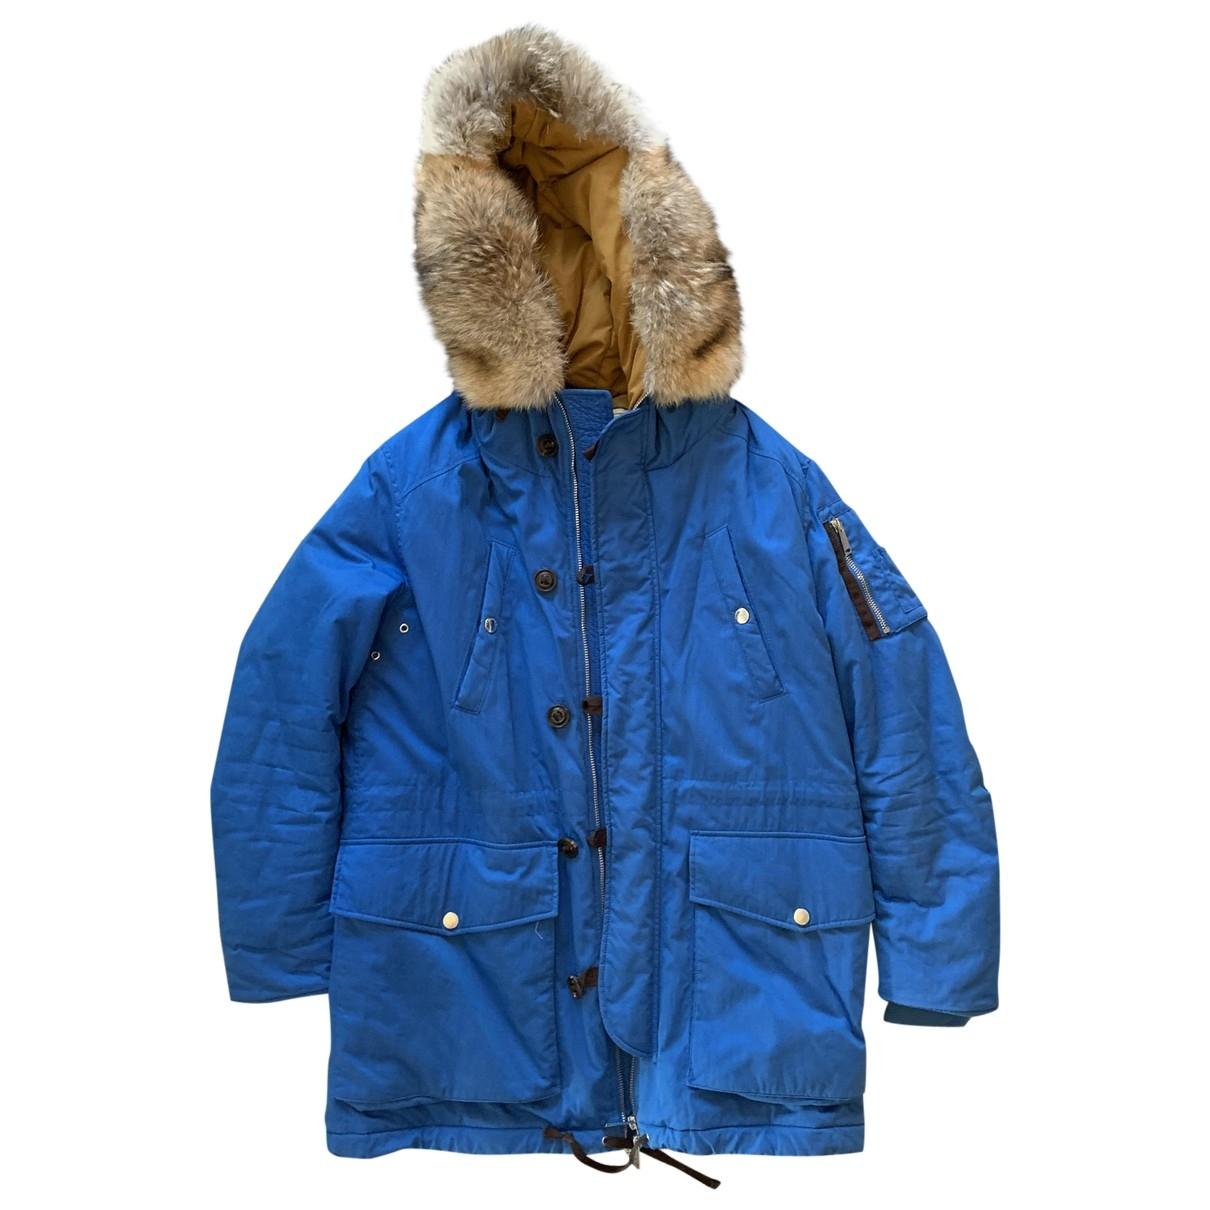 Dsquared2 \N Blue Cotton coat  for Men XL International